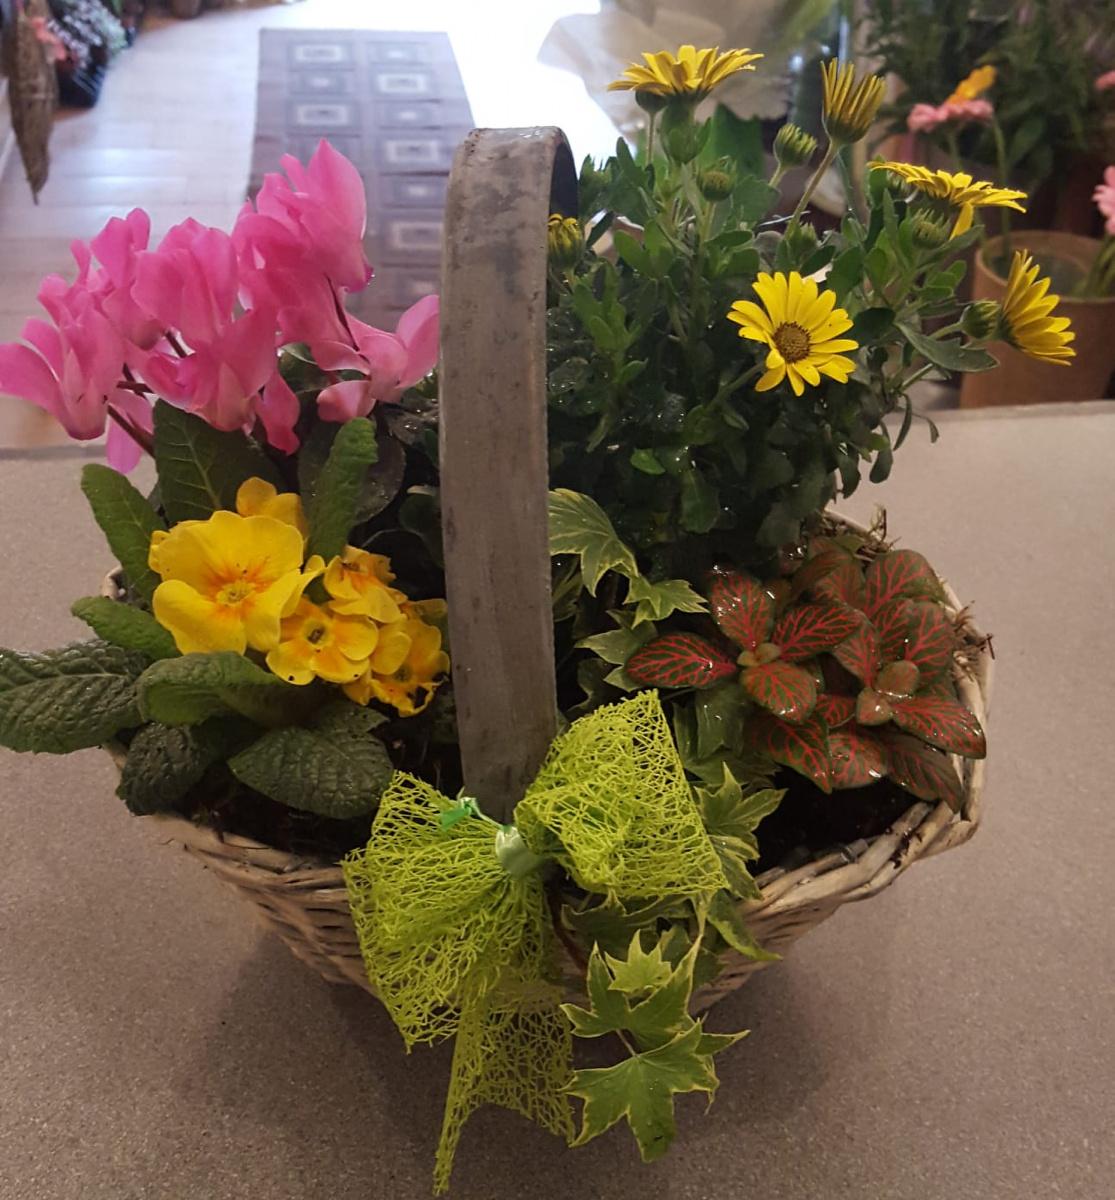 jugs-baskets-floral-arrangements-rugeley-florist-011